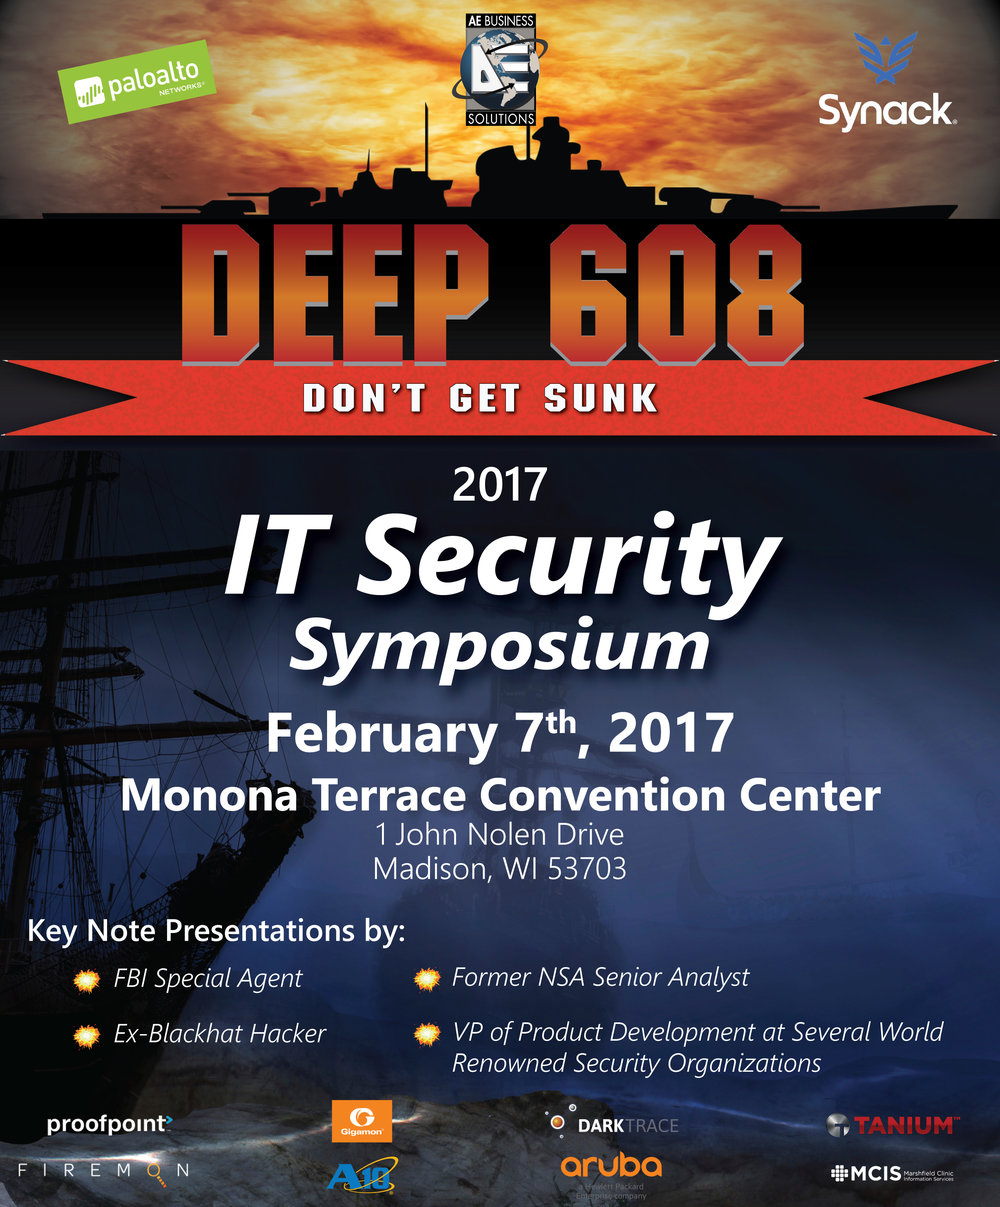 2017_DEEP608_Security_Symposium_Invite_Front-01.jpg